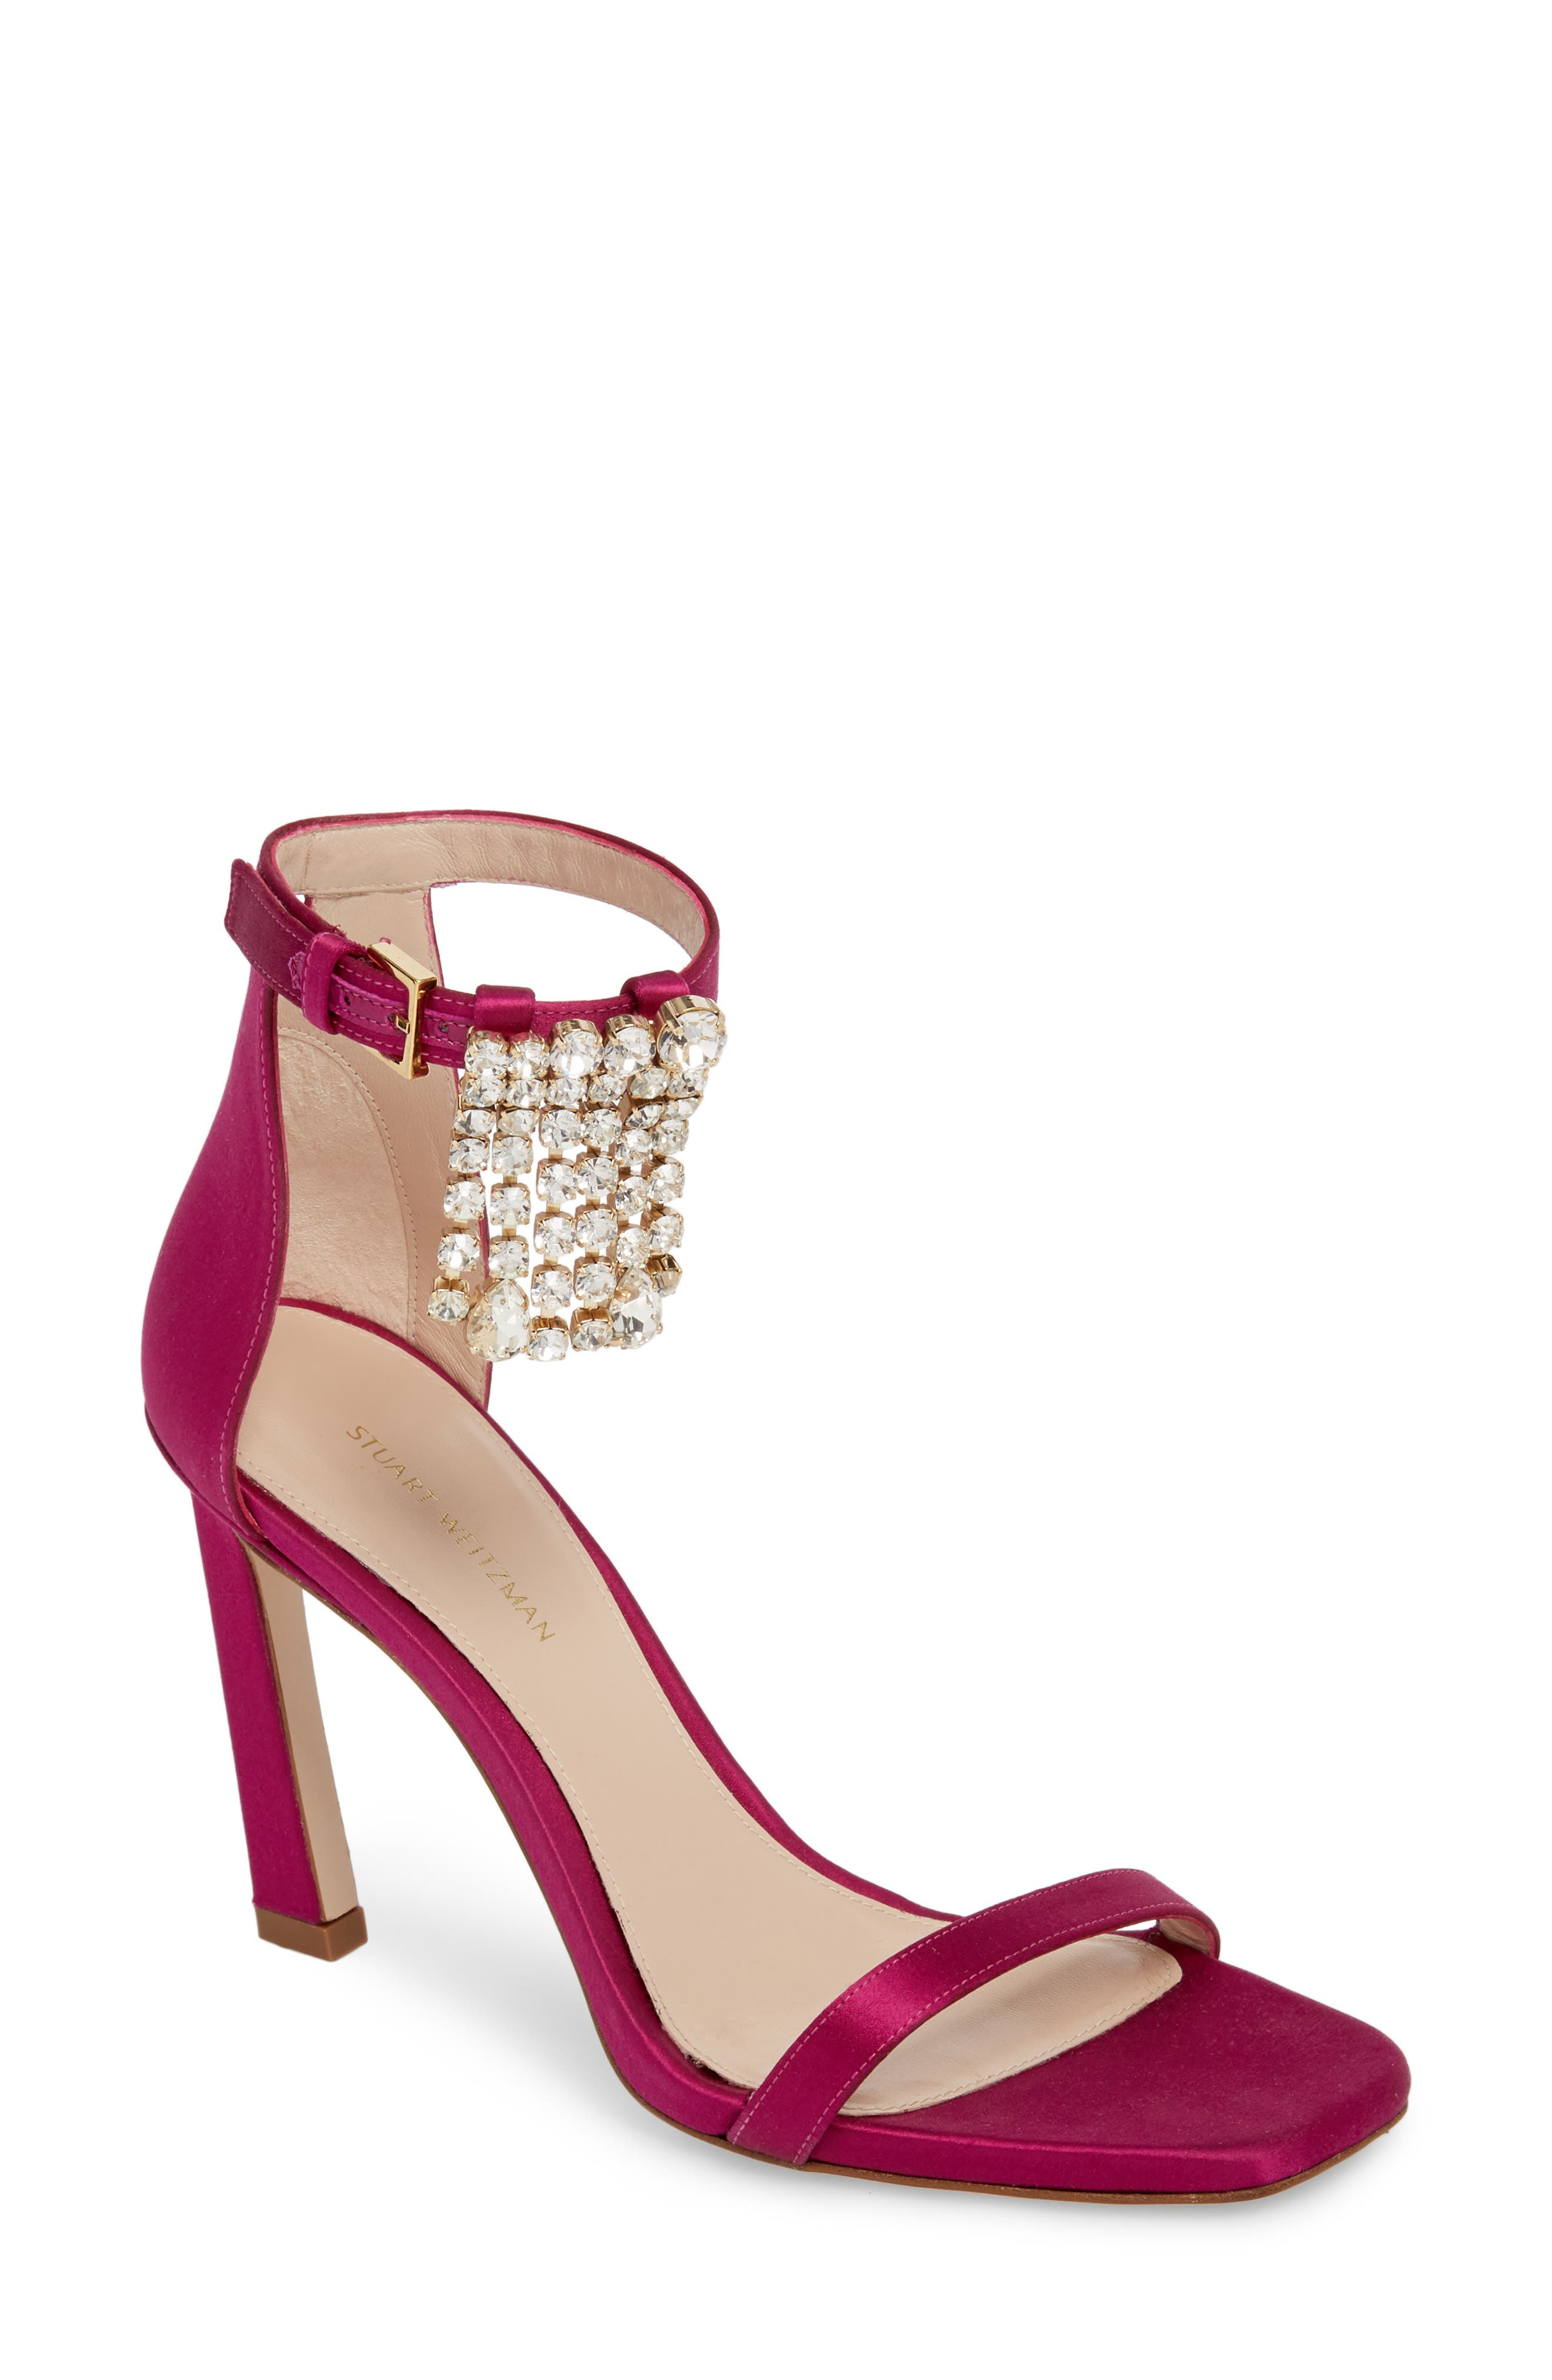 100FRINGESQUARENUDIST Sandal,                         Main,                         color, Grape Silk Satin